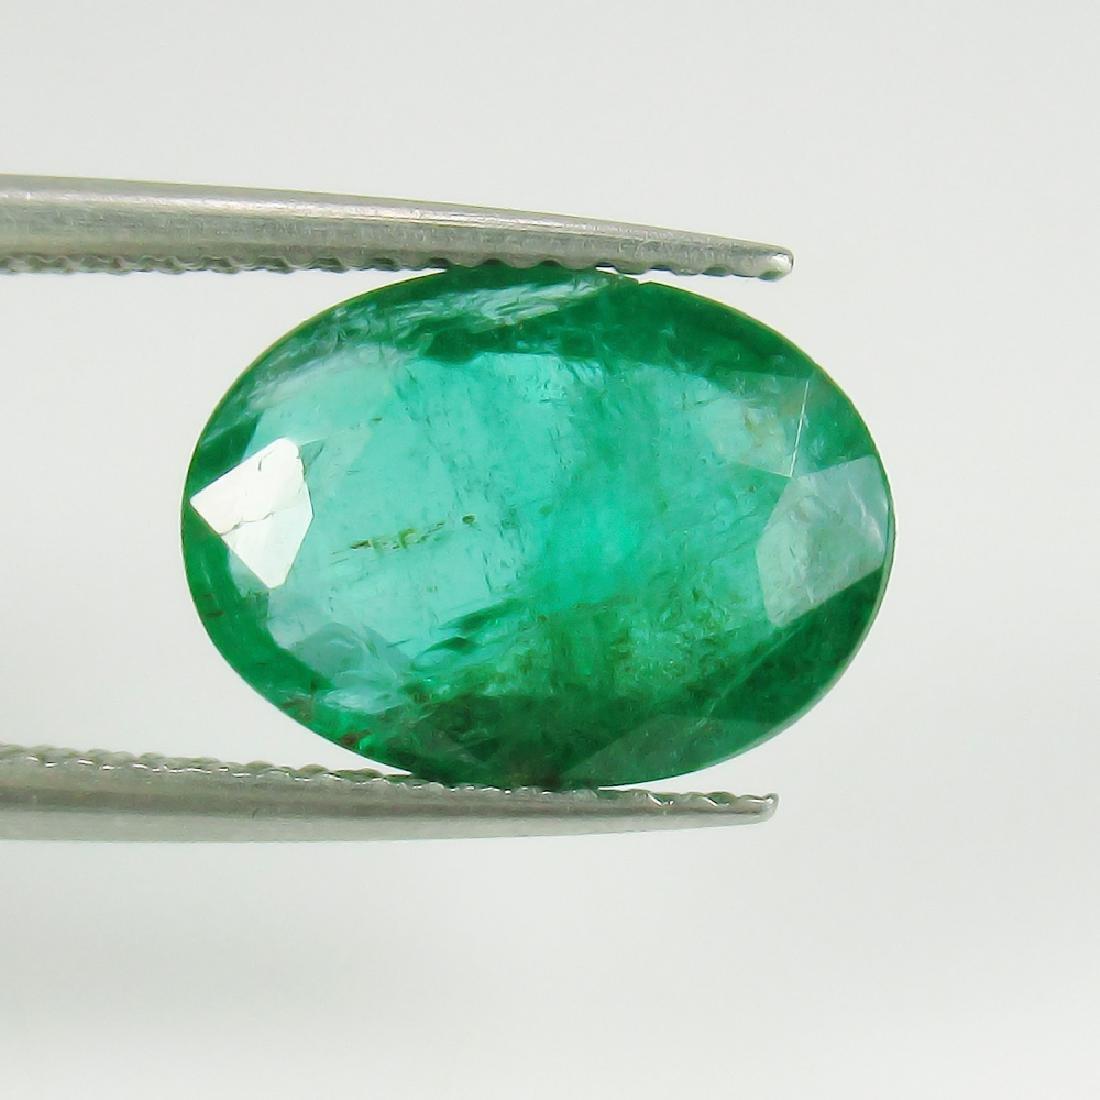 2.75 Ct IGI Certified Genuine Zambian Emerald Top Green